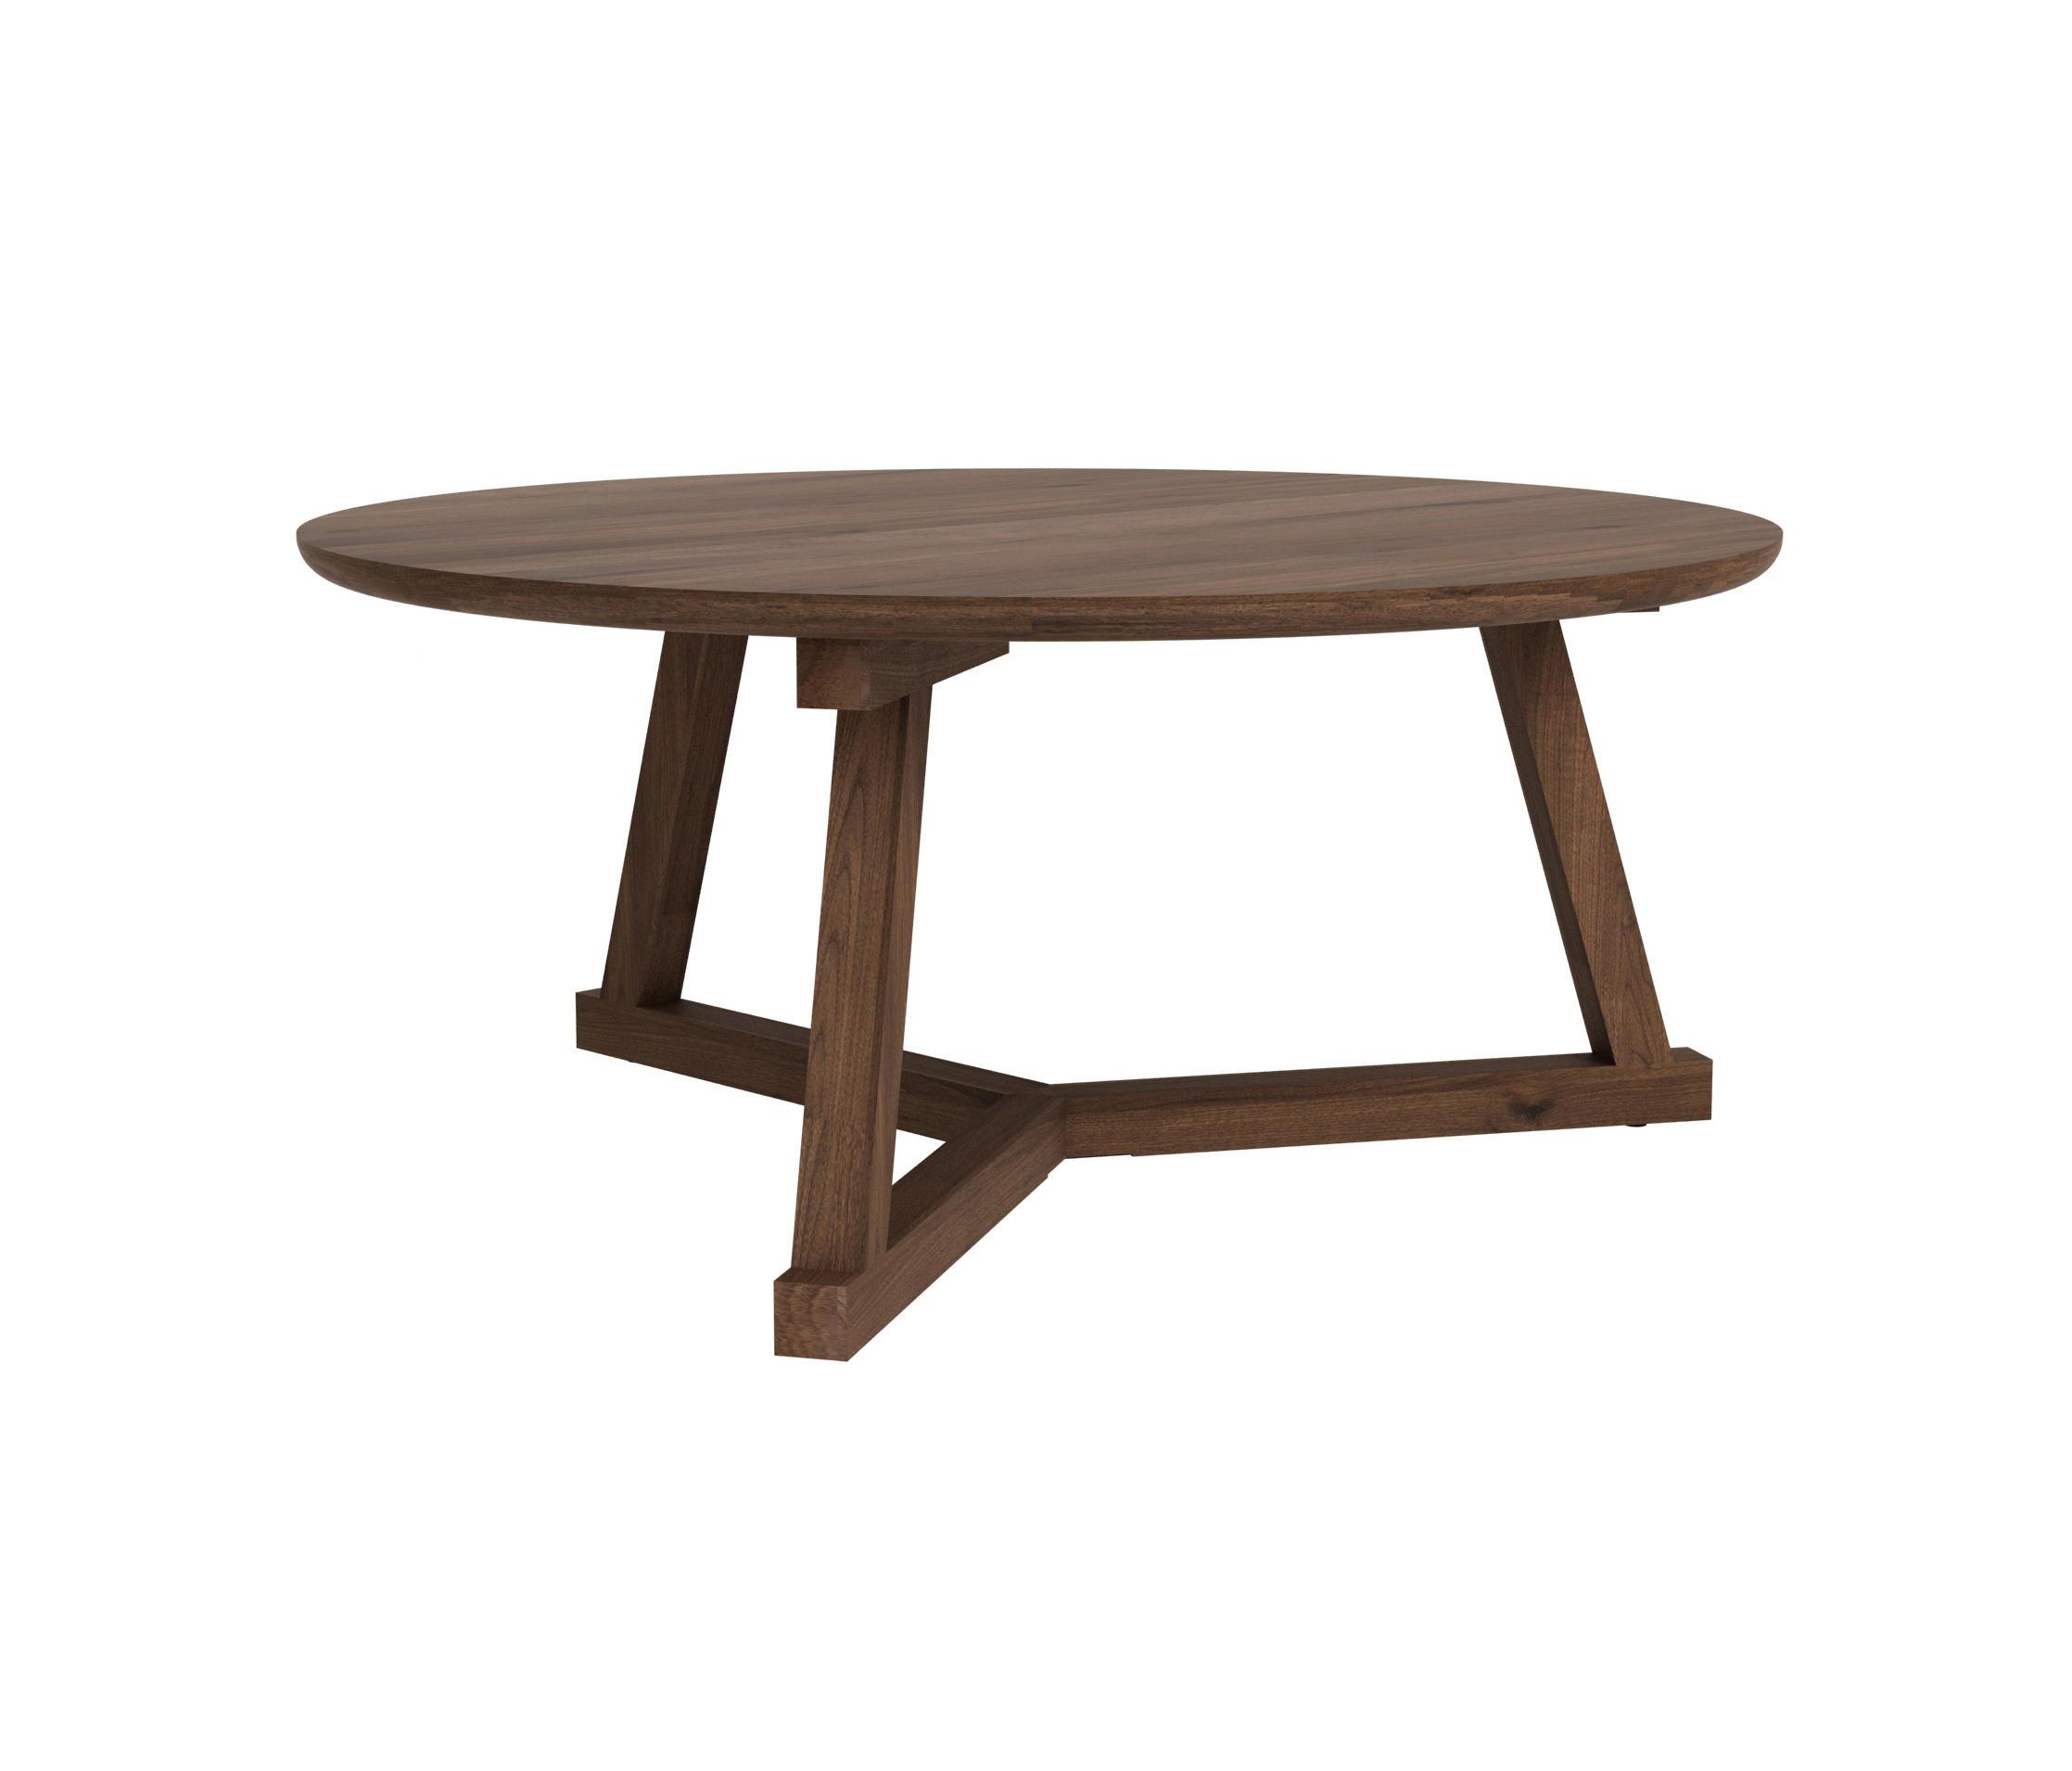 WALNUT TRIPOD COFFEE TABLE - Tables basses de Ethnicraft | Architonic